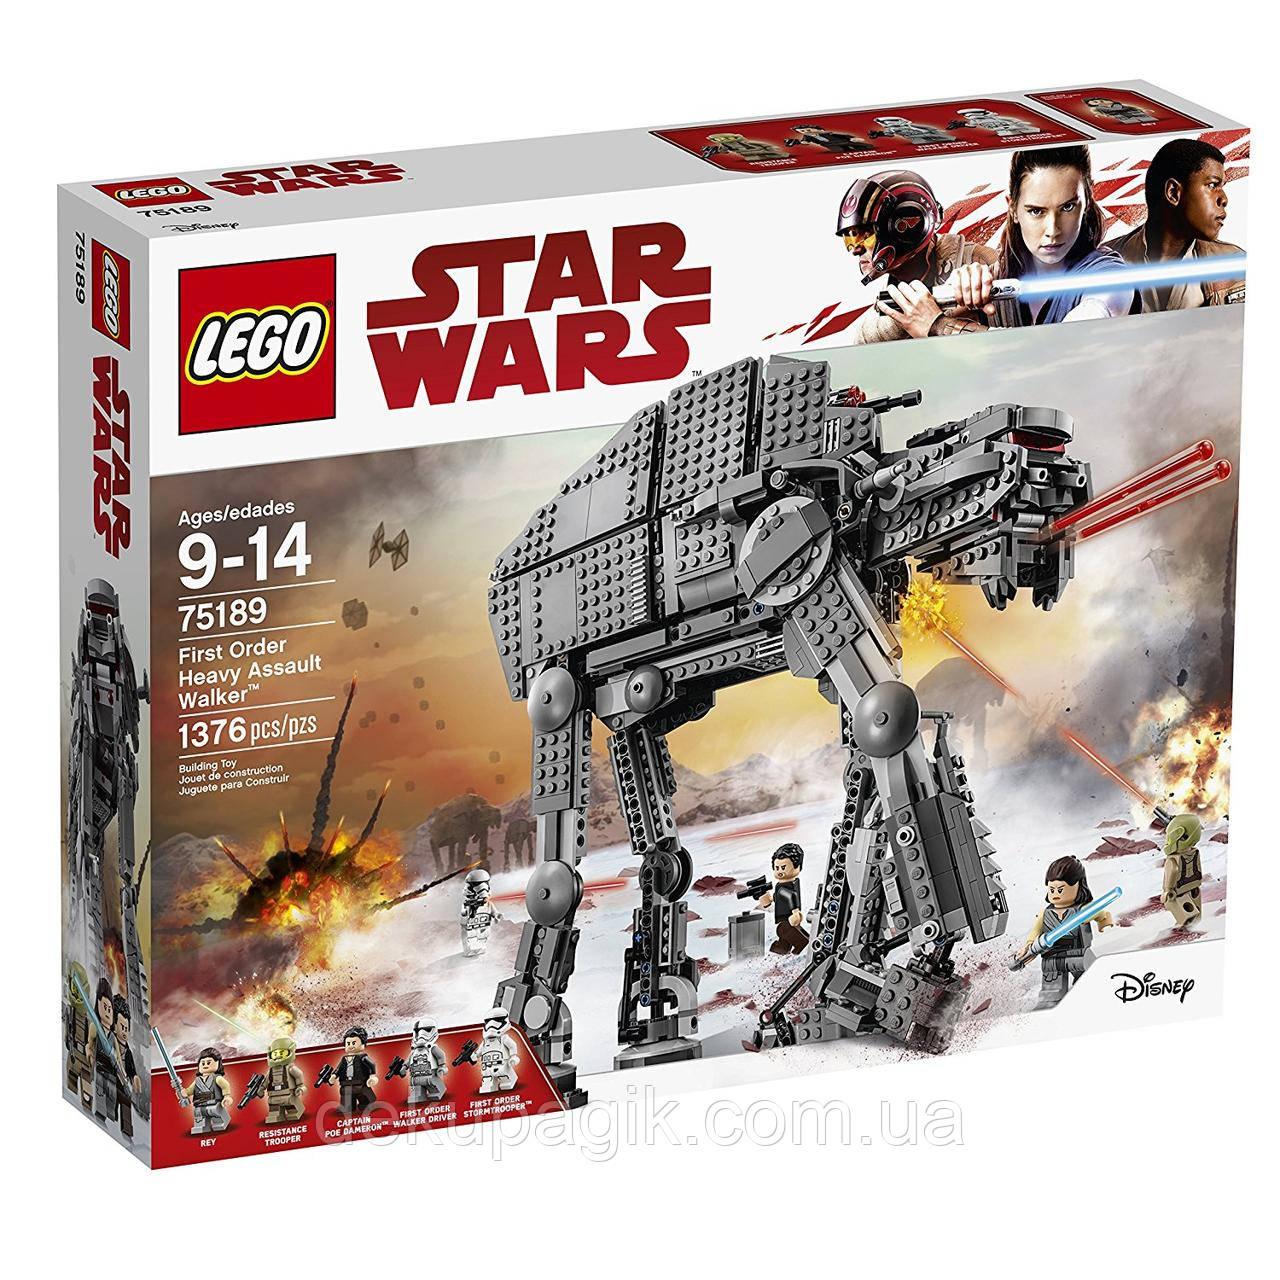 Lego Star Wars Штурмовой шагоход Первого Ордена 75189